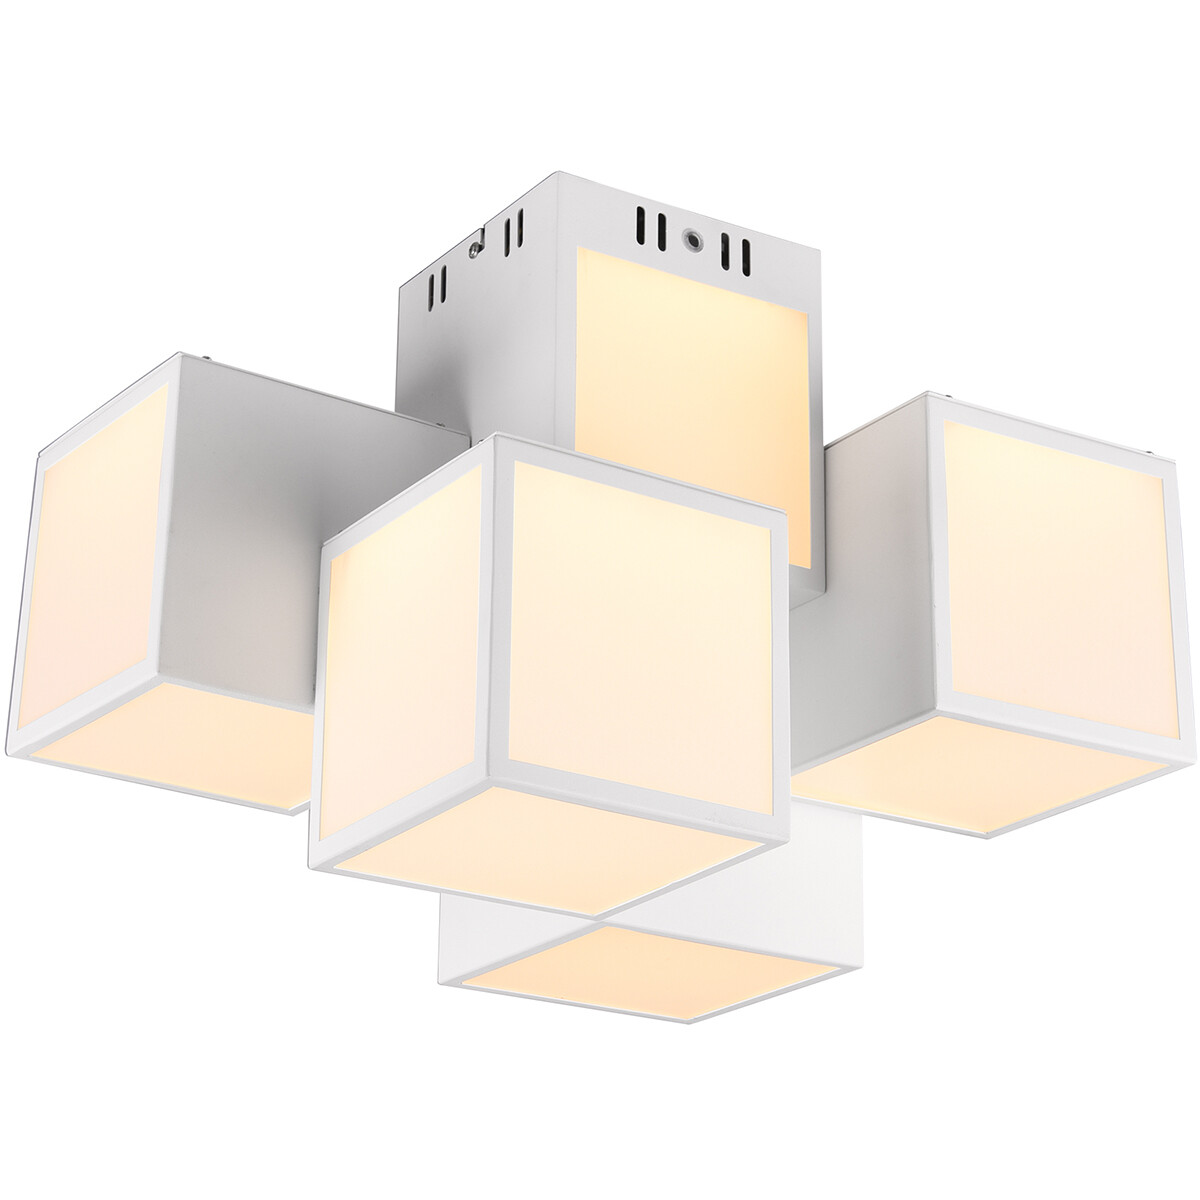 LED Plafondlamp WiZ - Smart LED - Plafondverlichting - Trion Oski - 35W - Aanpasbare Kleur - 5-licht